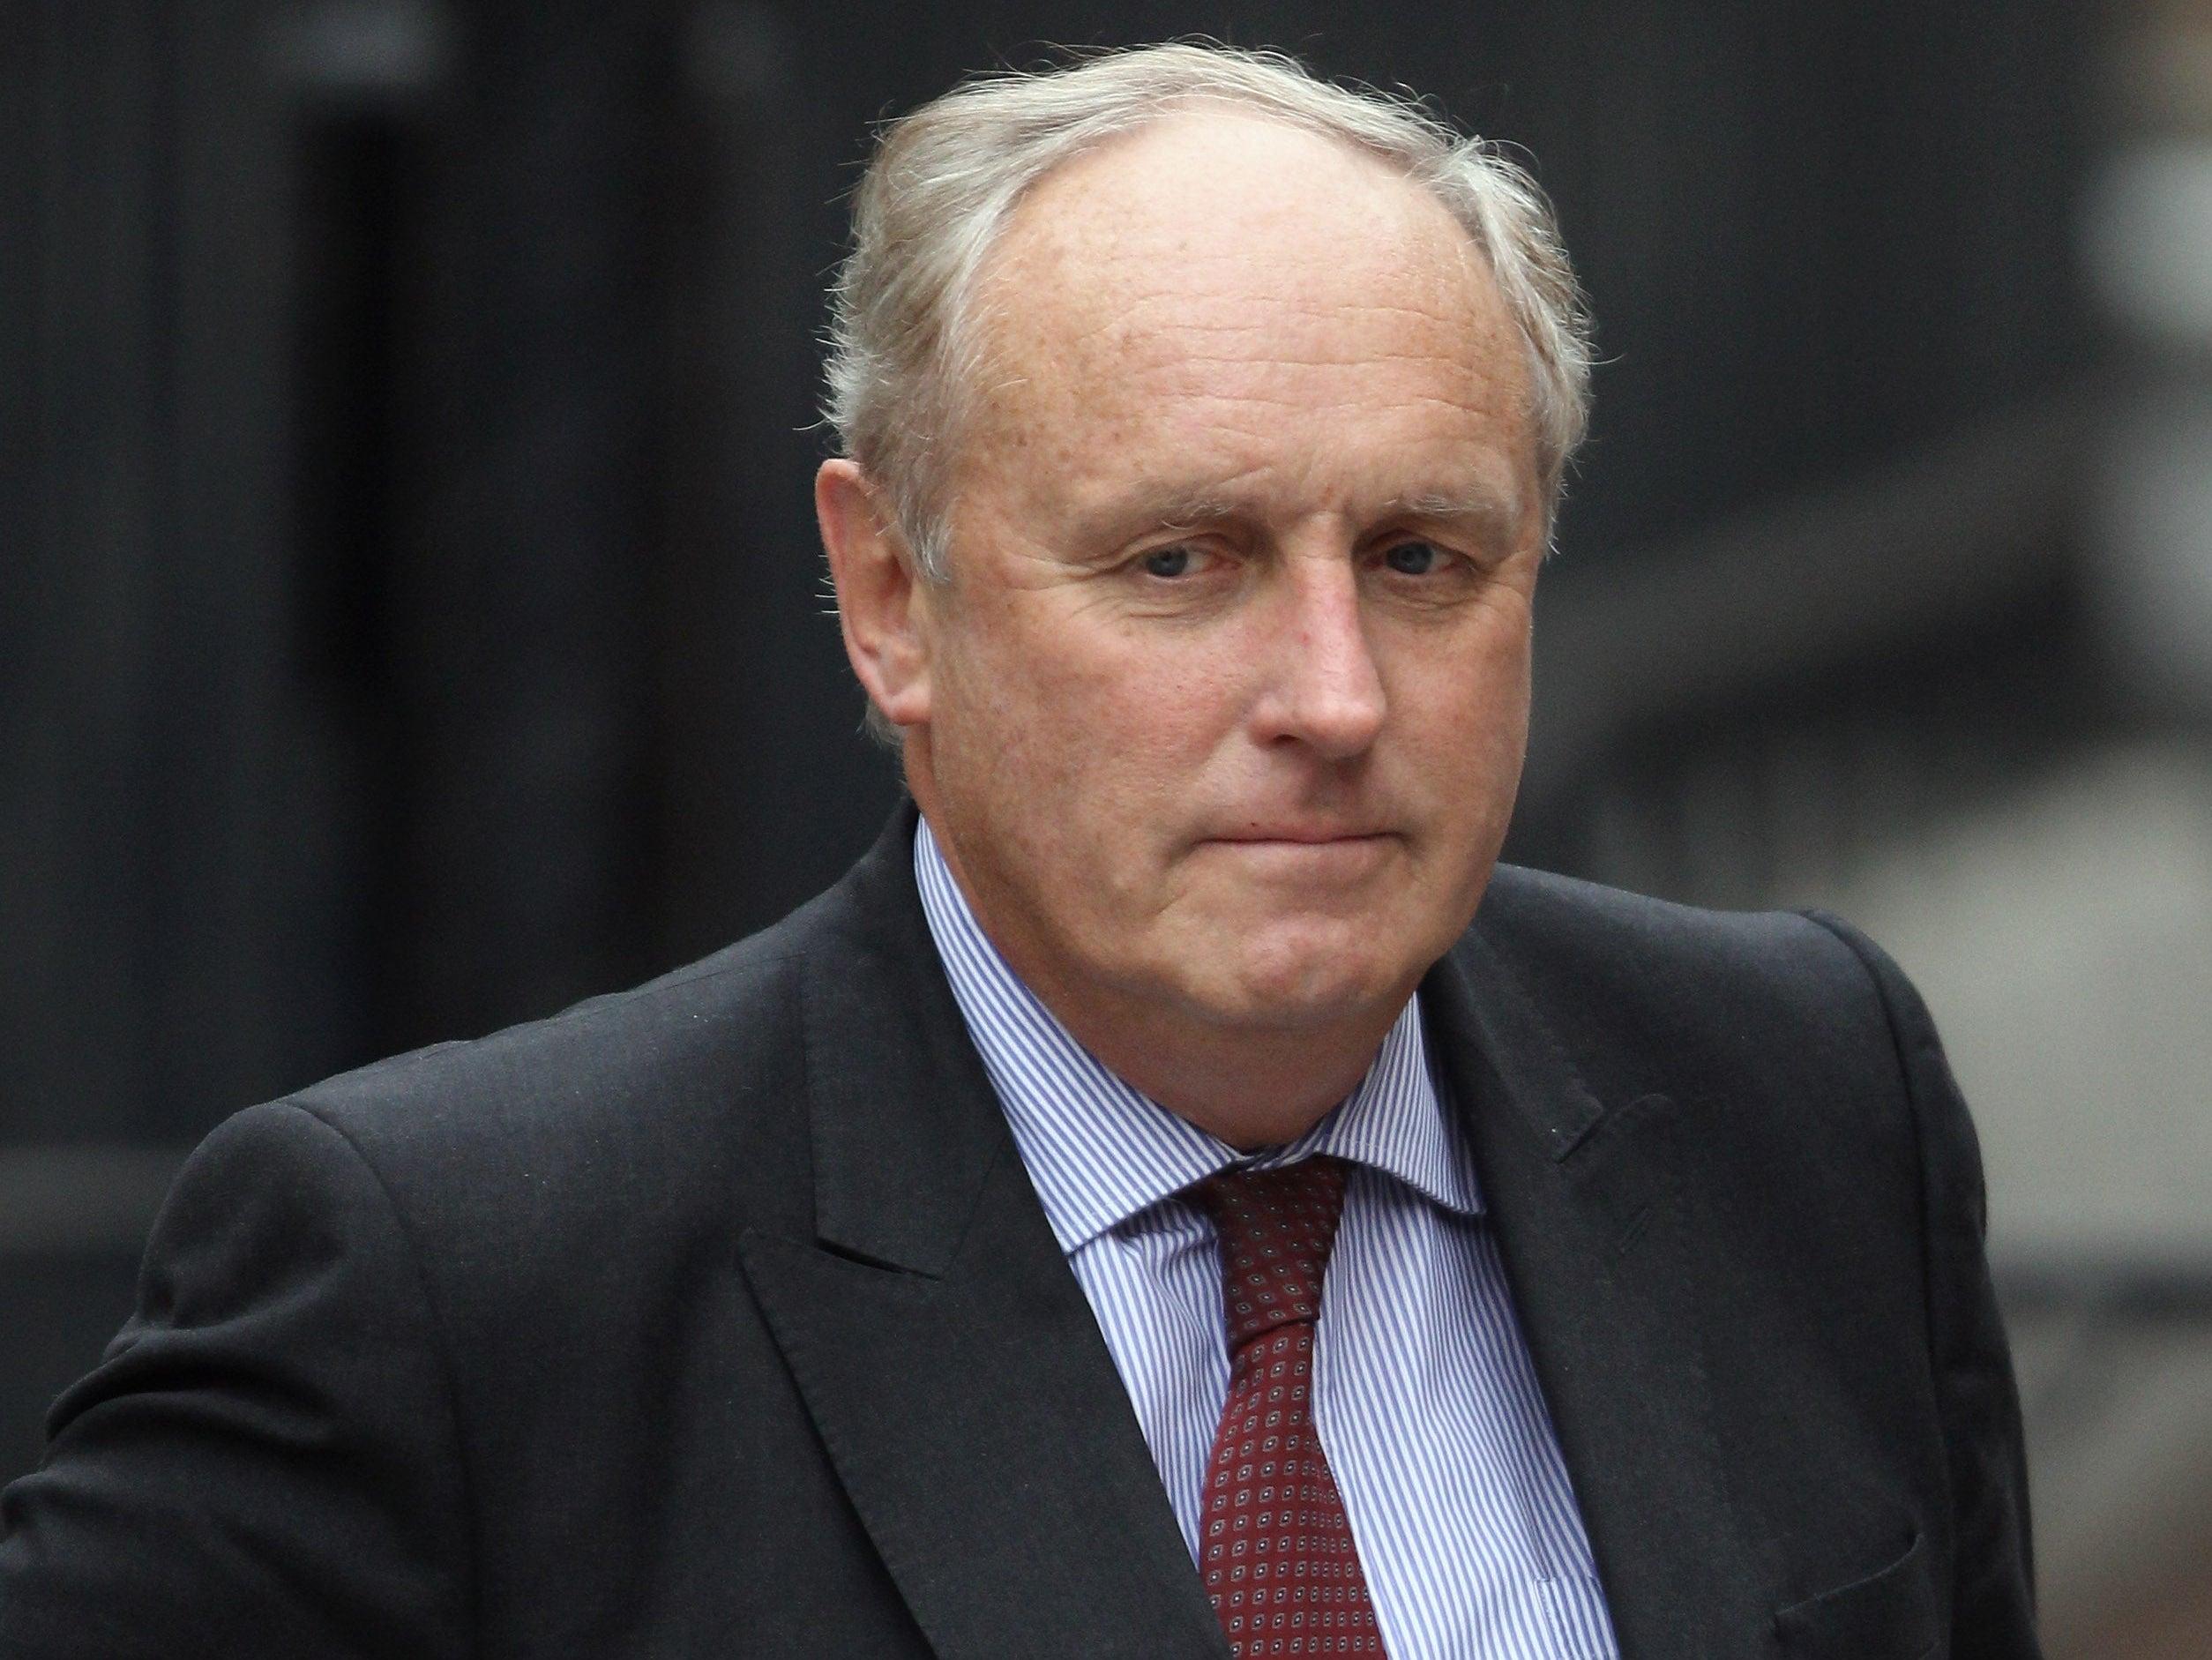 Boris Johnson 'asks former Daily Mail editor Paul Dacre to chair Ofcom'